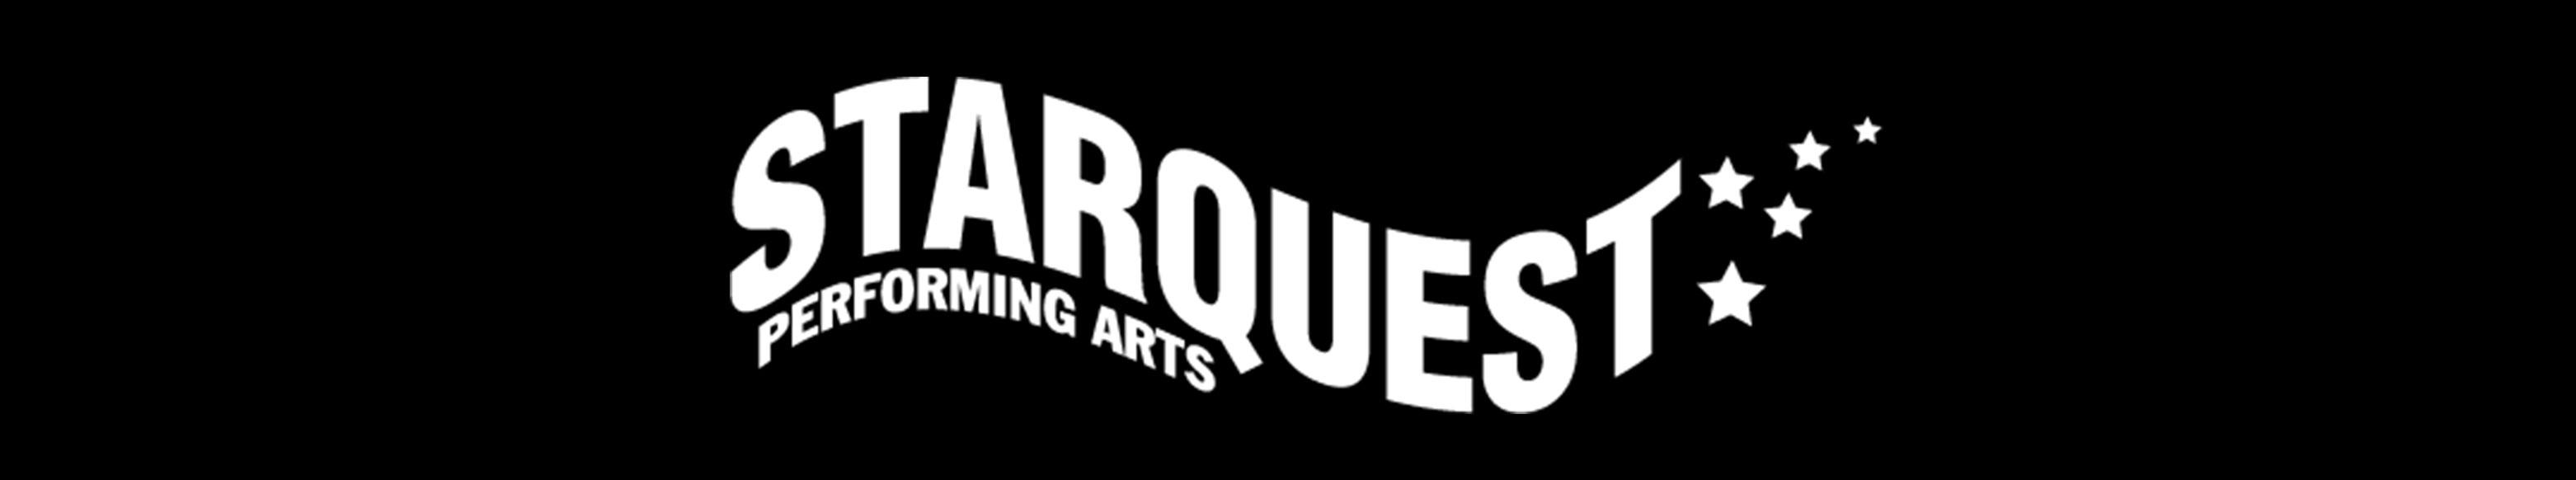 Starquest Perfoming Arts School